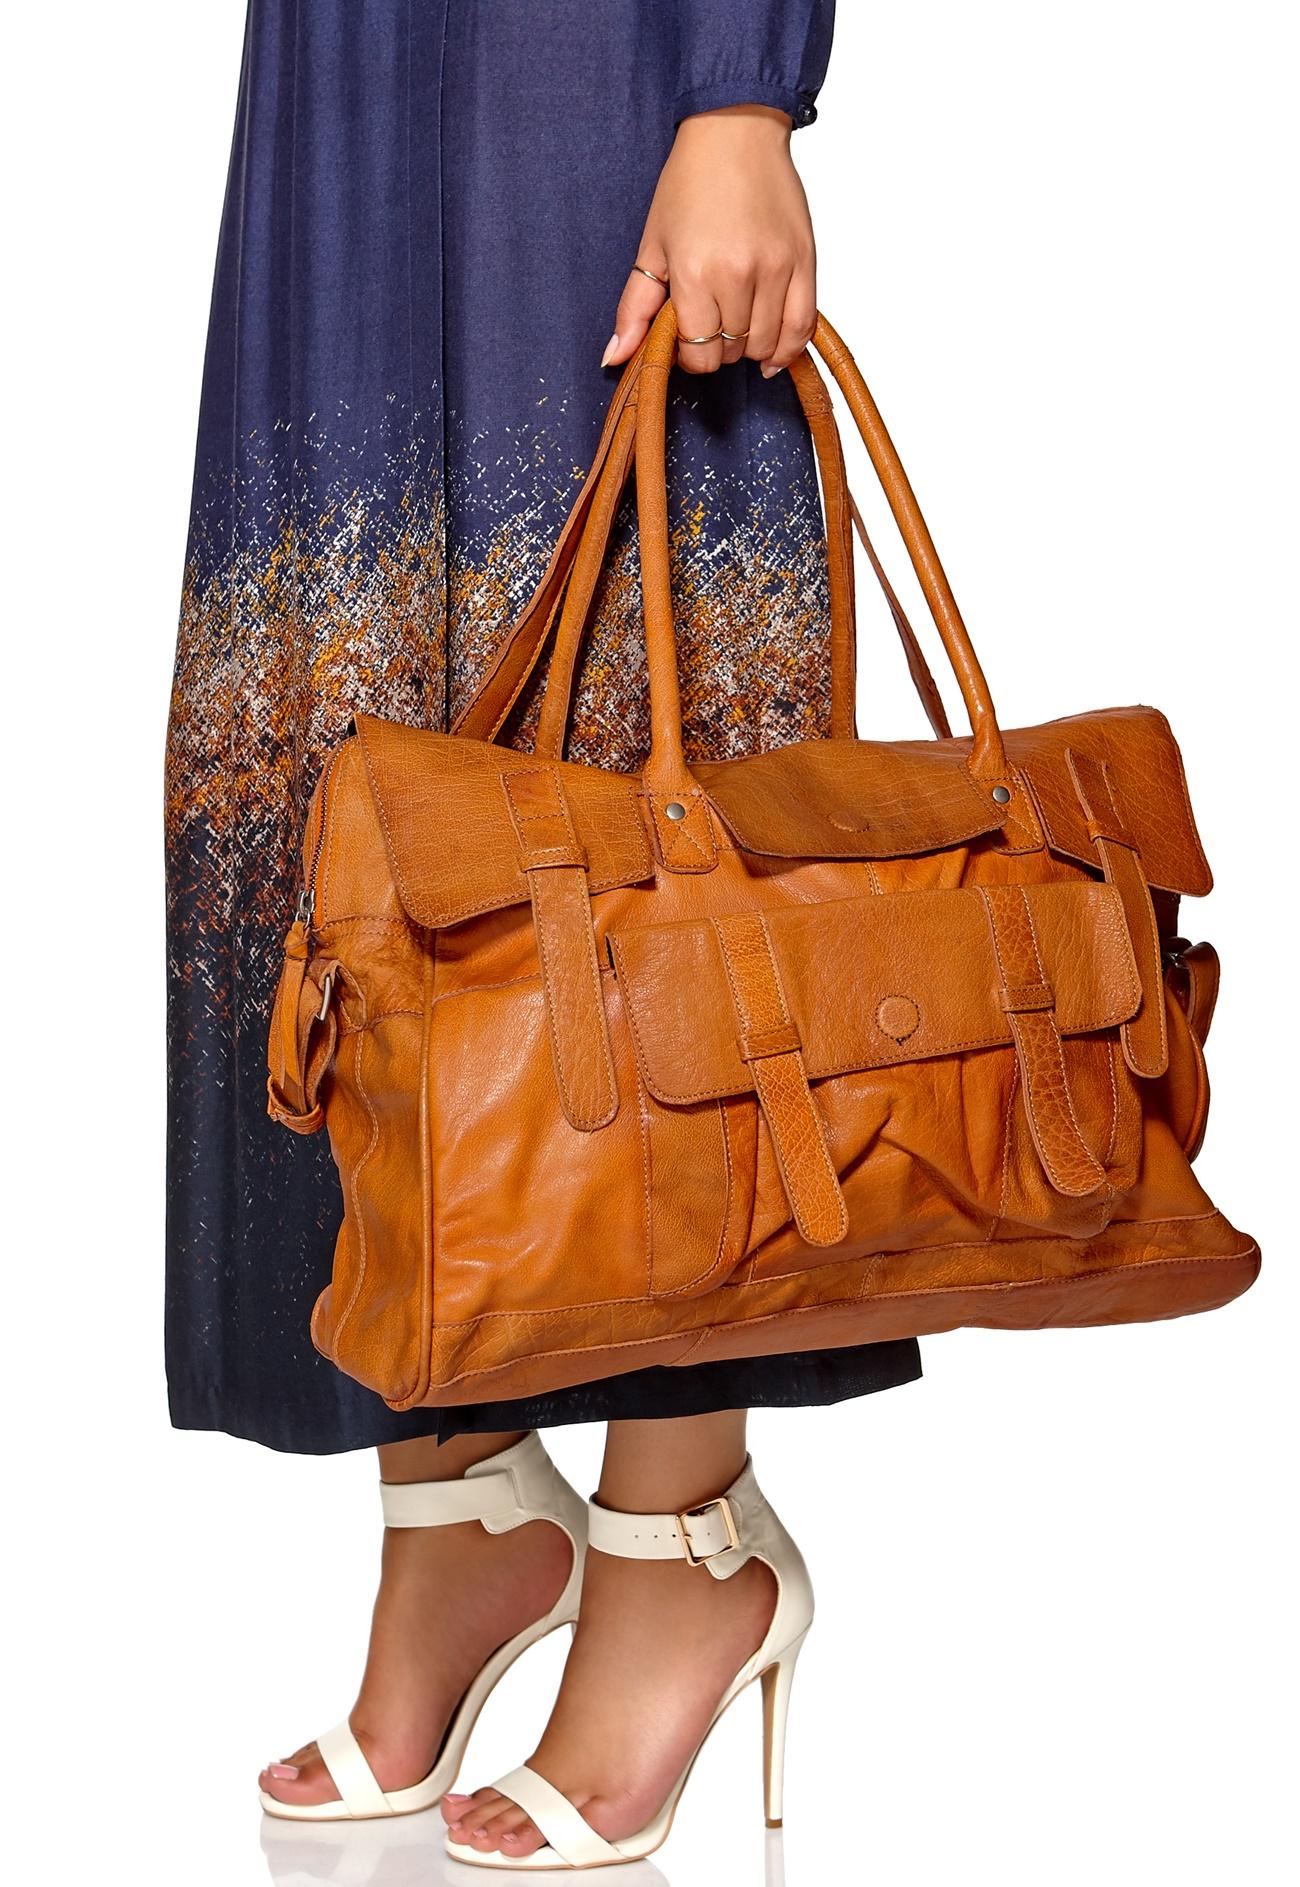 Laukut Pieces : Pieces makie leather travel bag konjakki bubbleroom